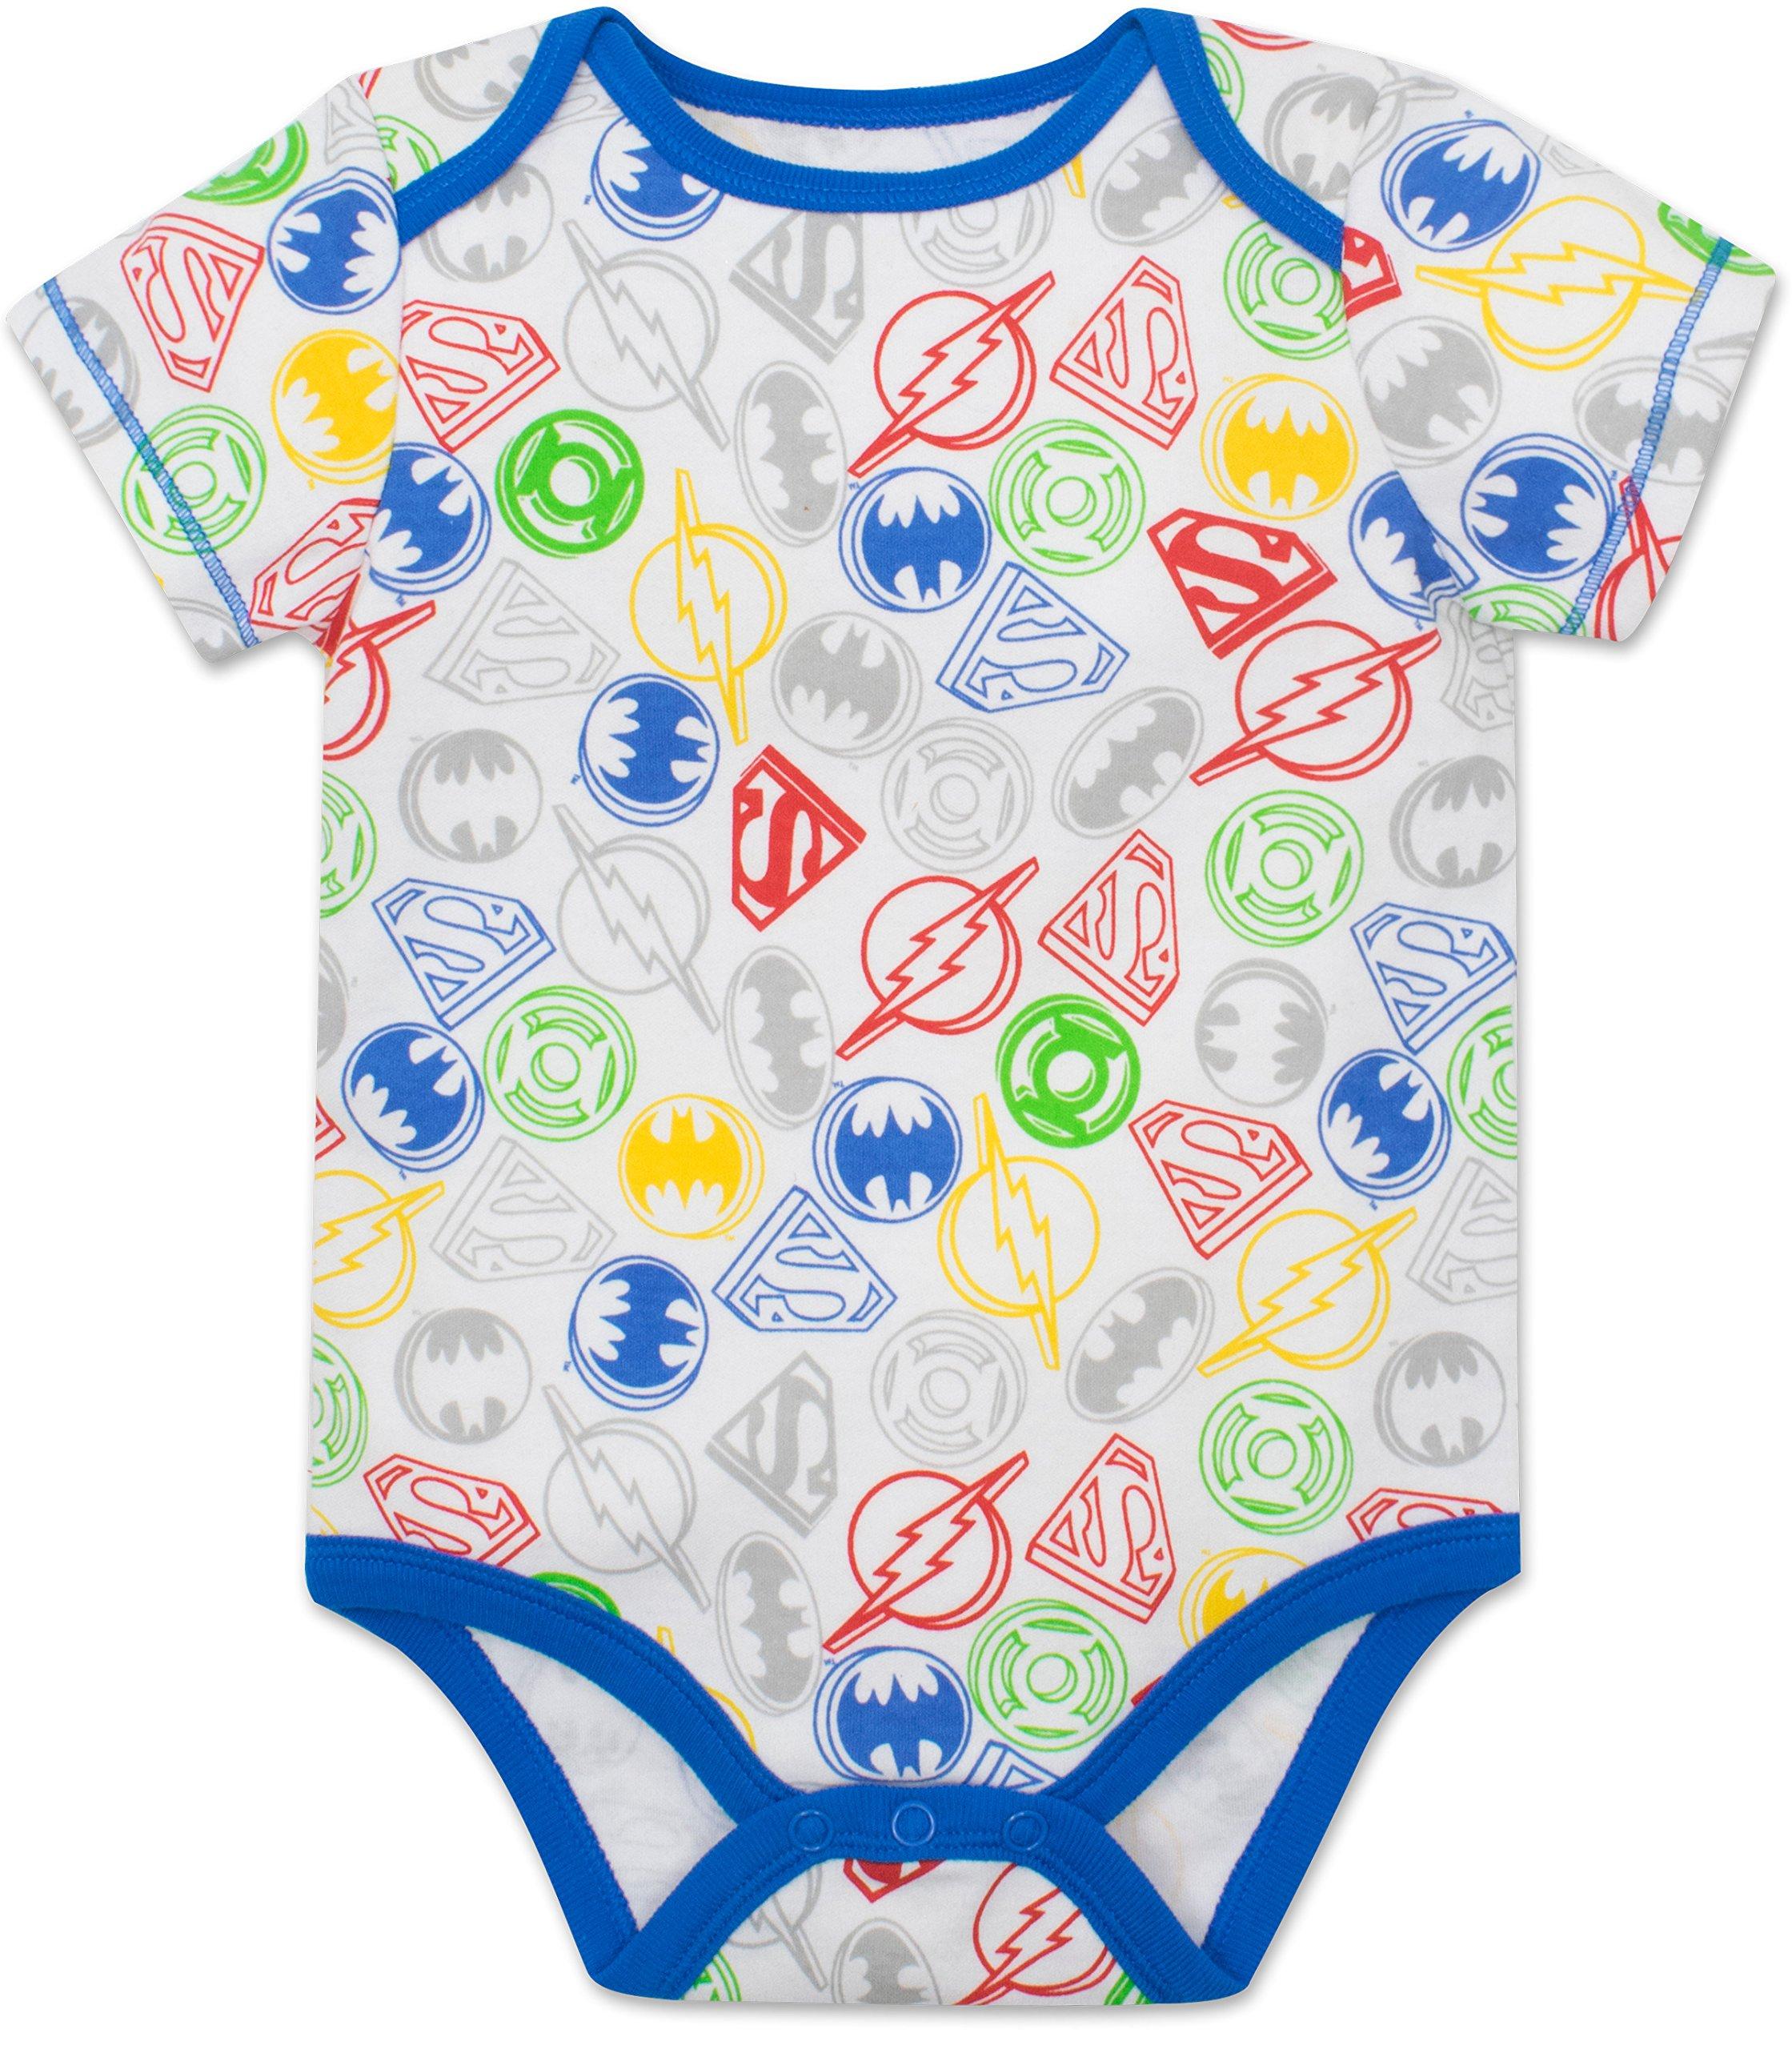 Justice League Baby Boys' 5 Pack Superhero Onesies - Batman, Superman, The Flash and Green Lantern (6-9M) by Warner Bros. (Image #6)